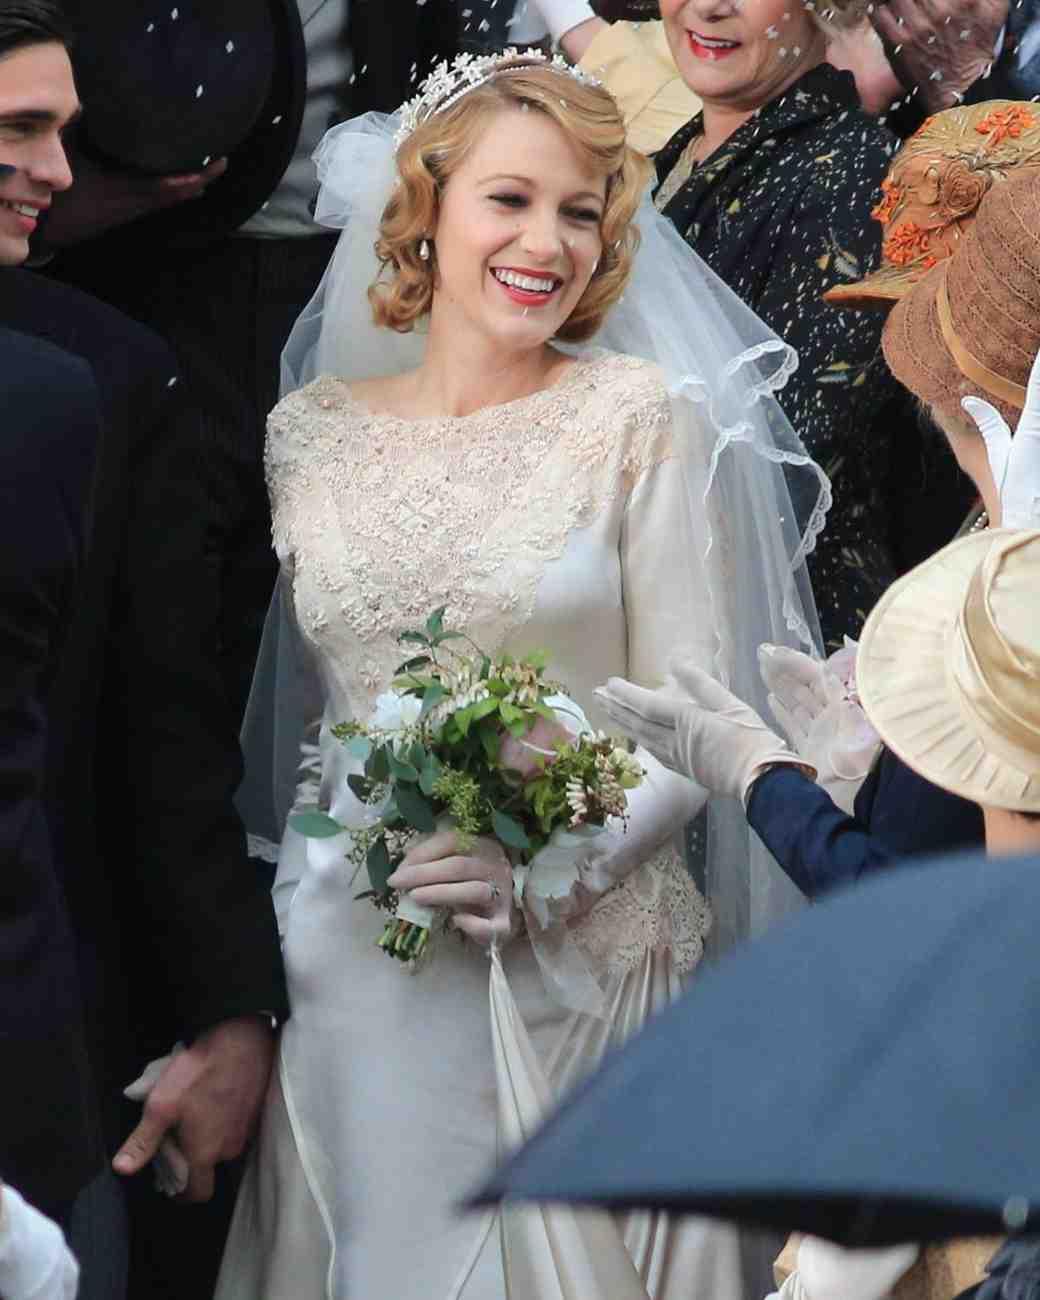 movie-wedding-dresses-age-of-adaline-blake-lively-0316.jpg